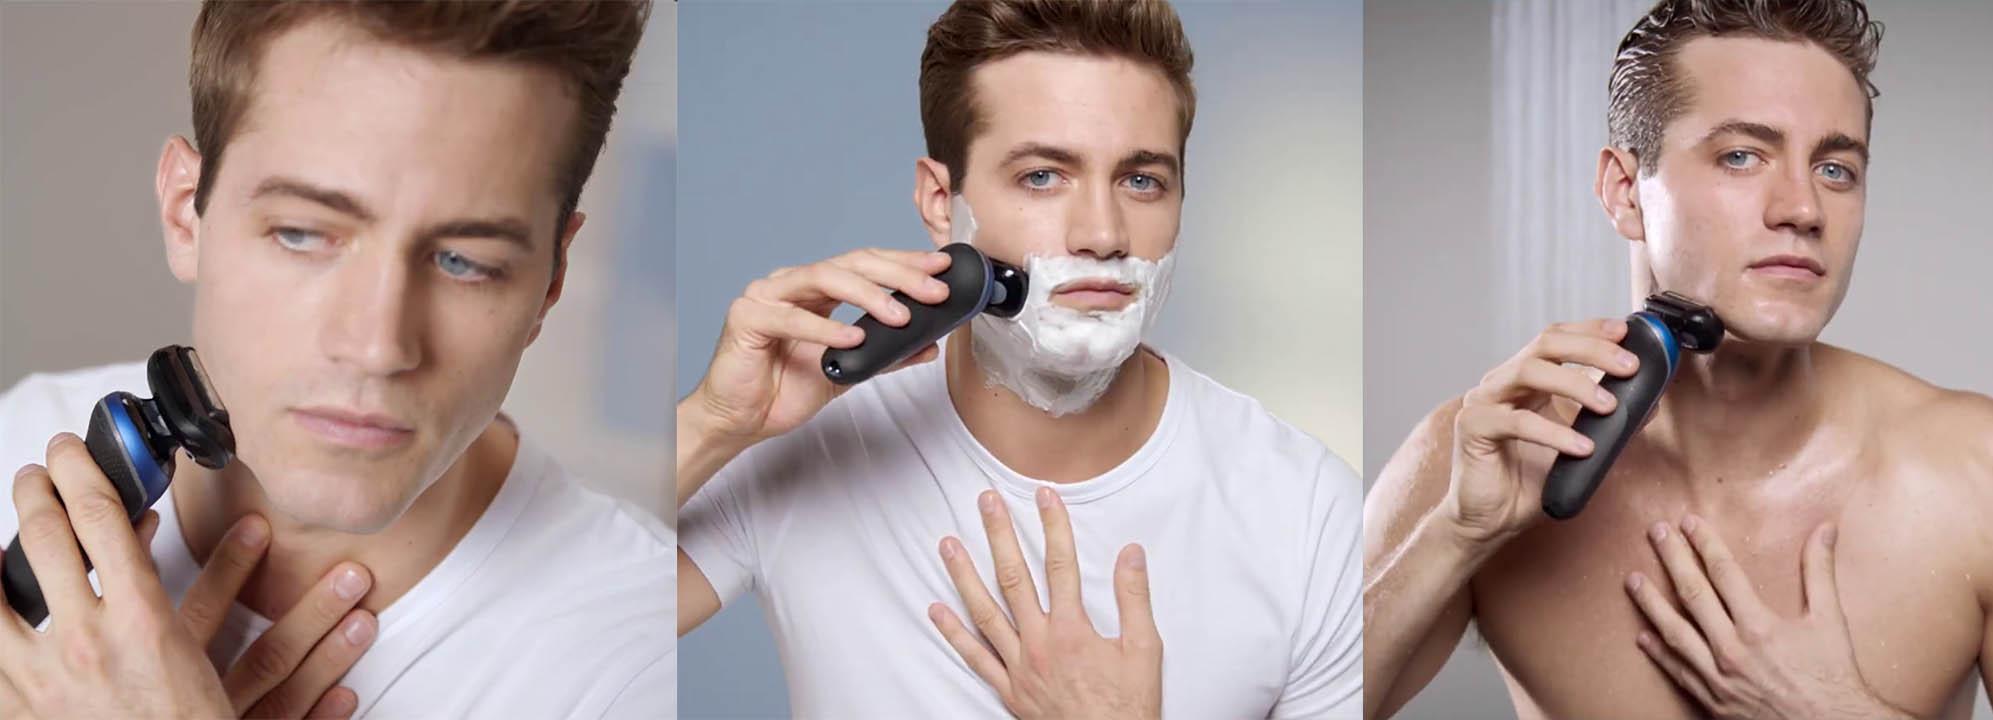 wet & dry shaving with braun 6020s